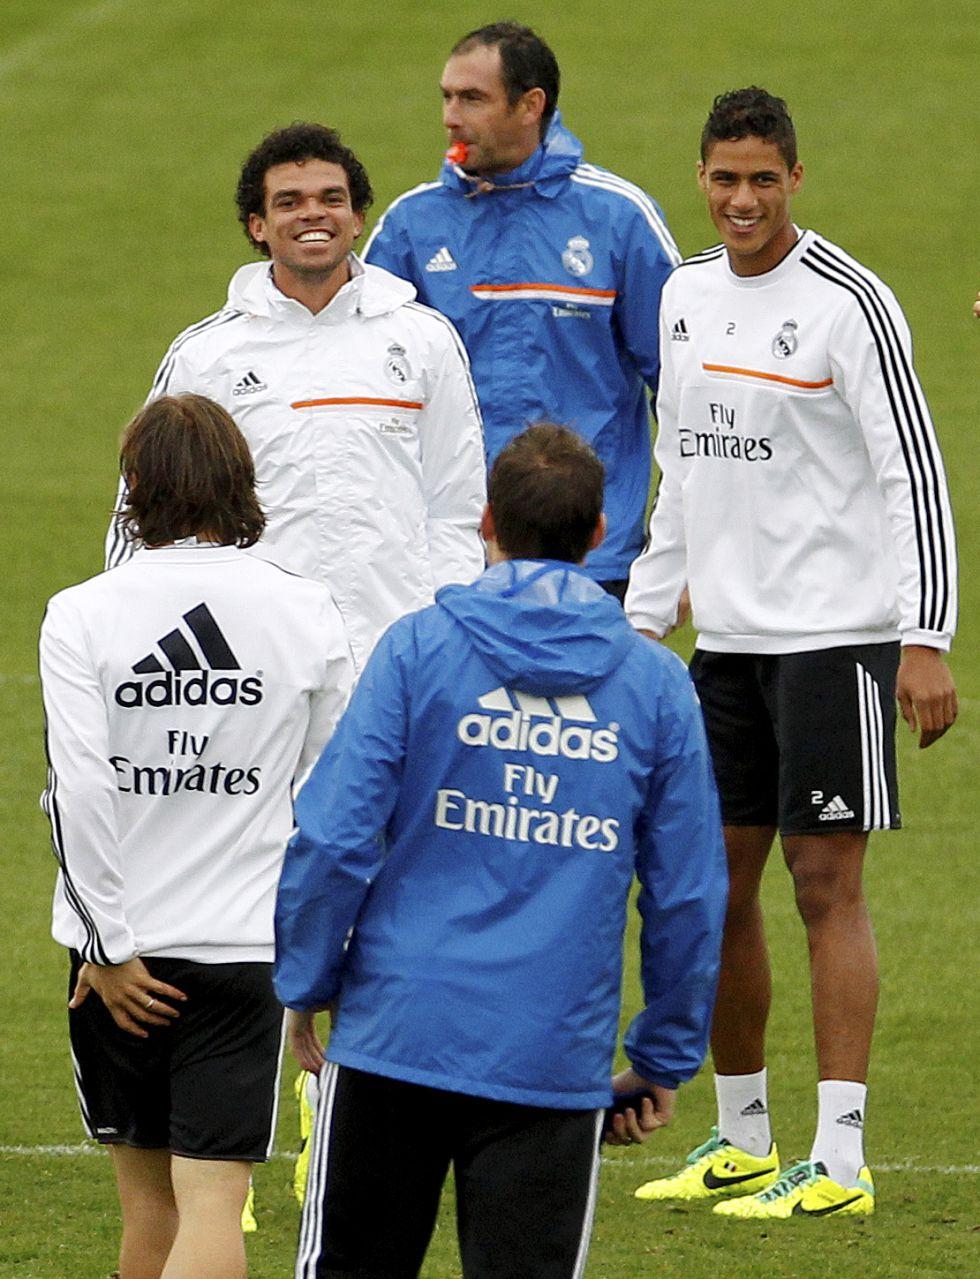 Pepe y Varane, la pareja de centrales favorita de Ancelotti - AS.com